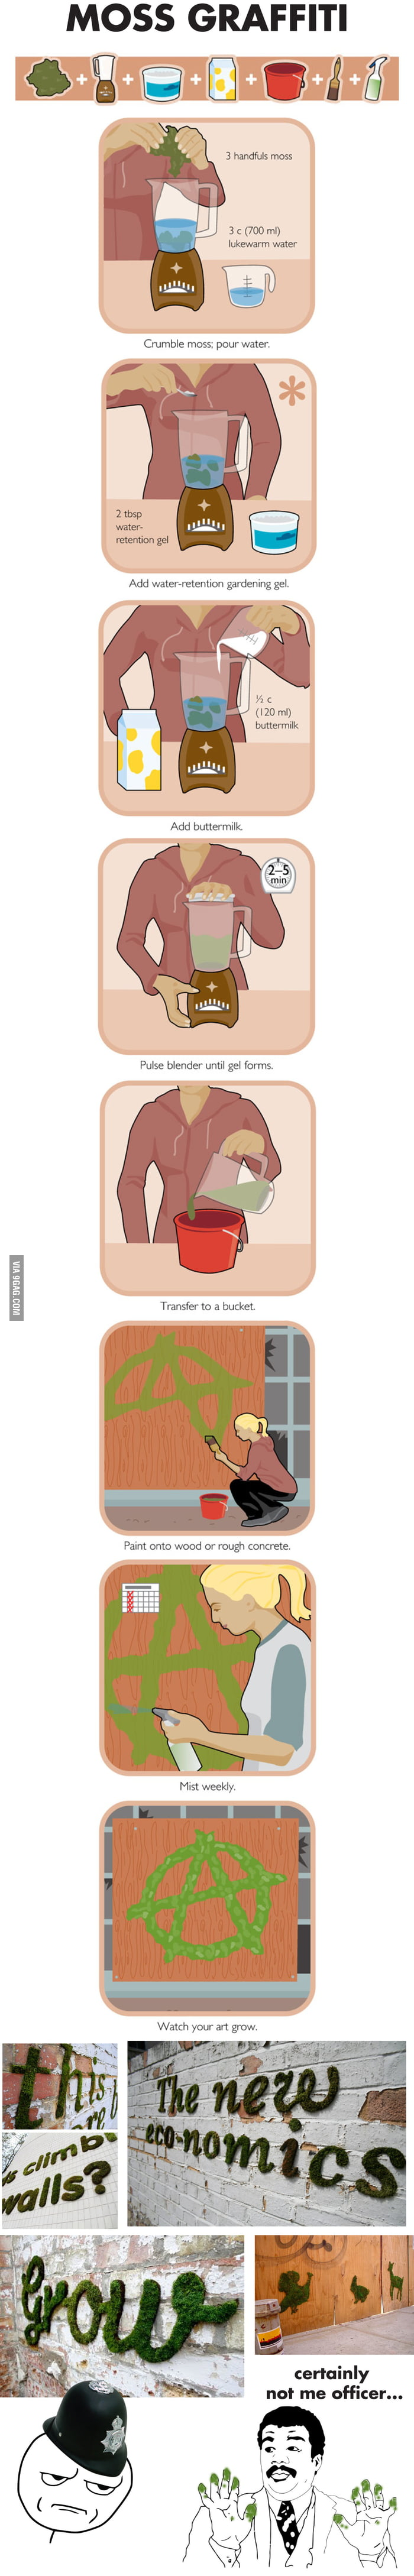 Moss graffiti HOW TO